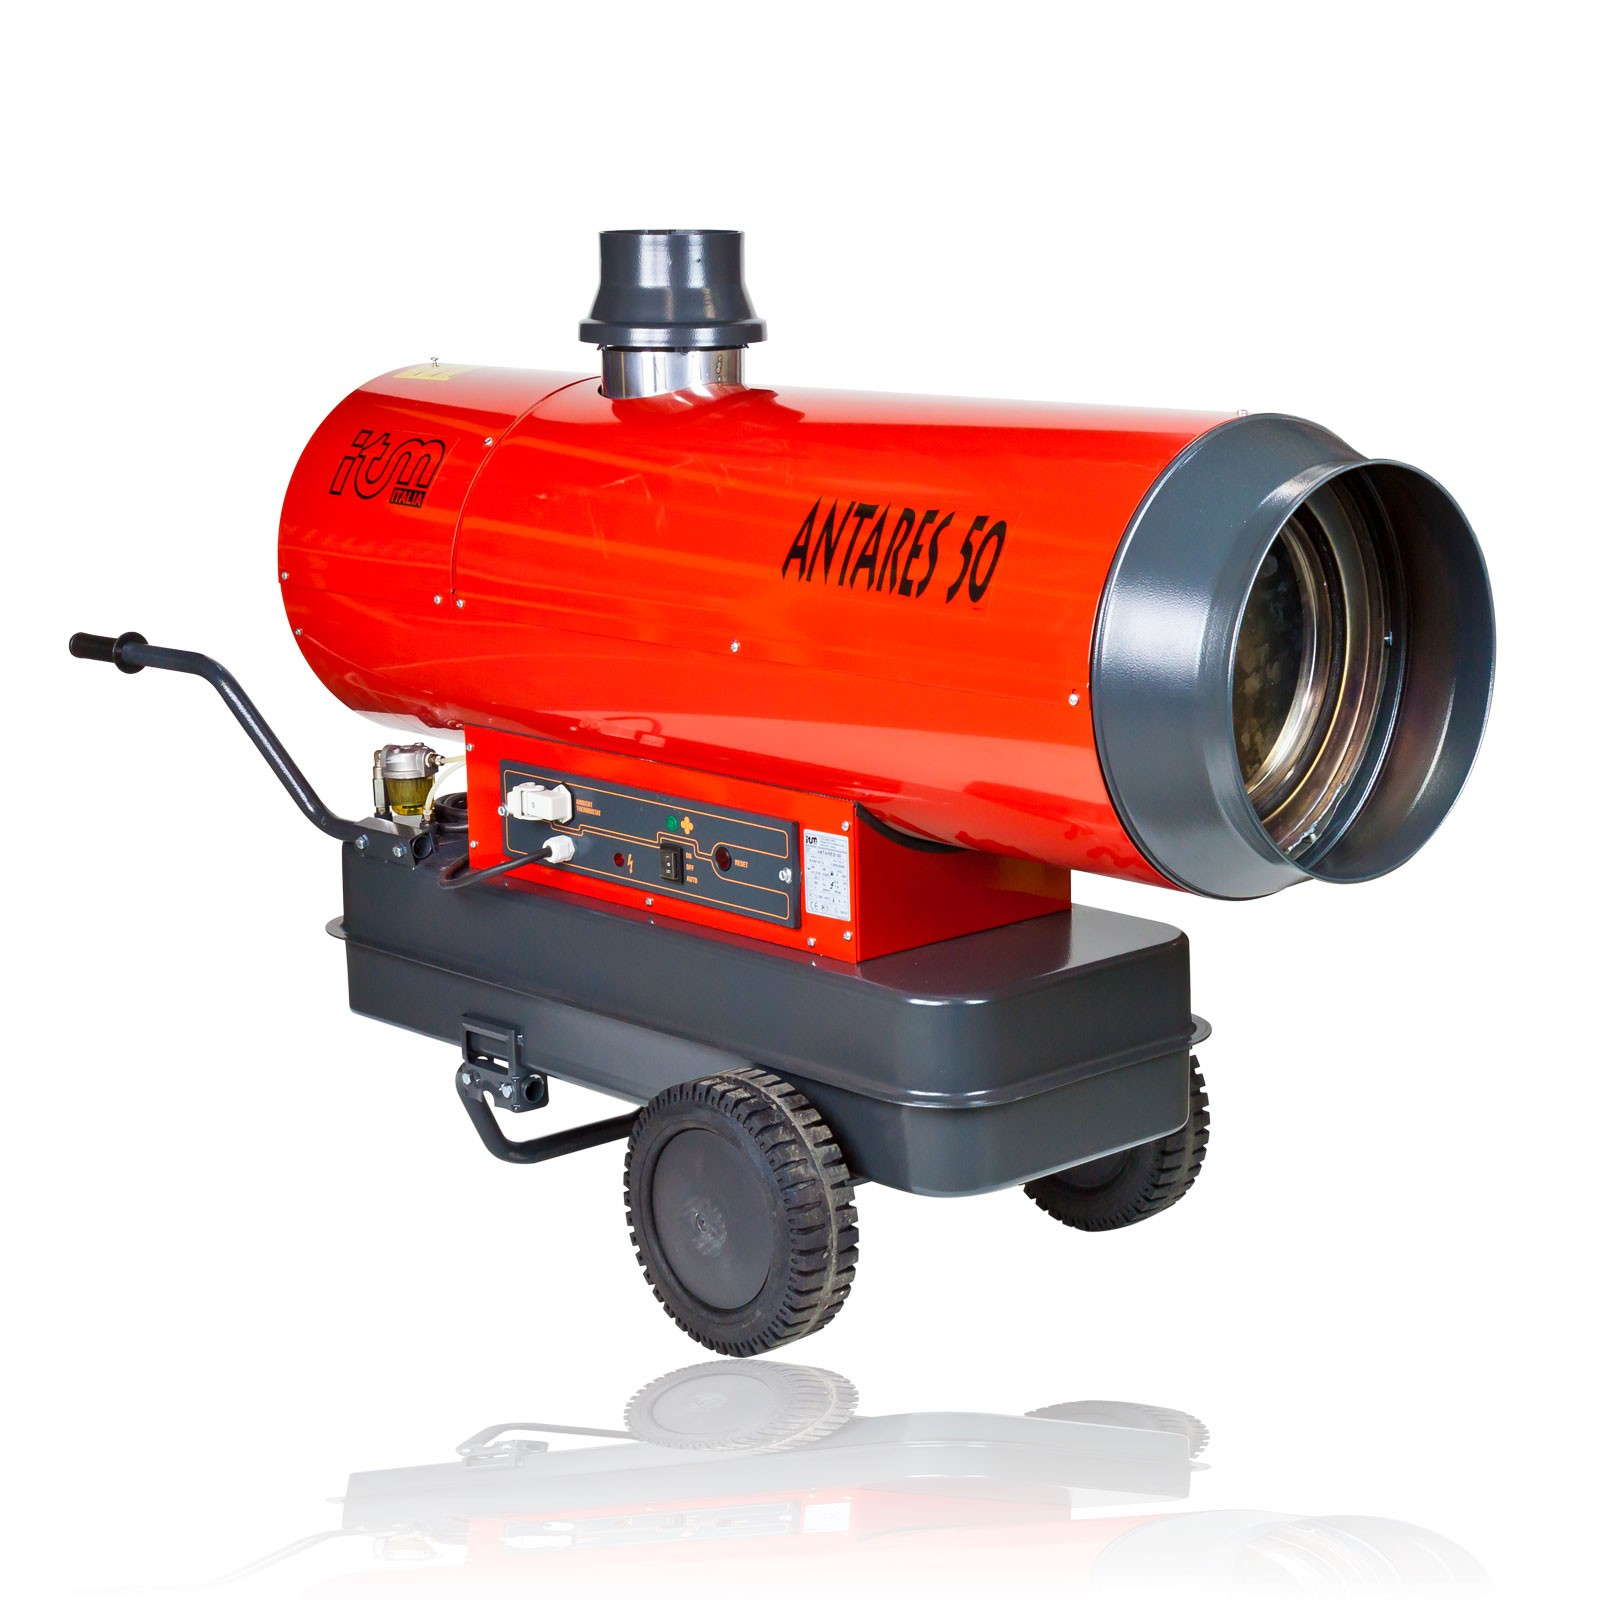 Ölheizgerät Antares 50 Diesel Heizkanone 50kW Heizgebläse